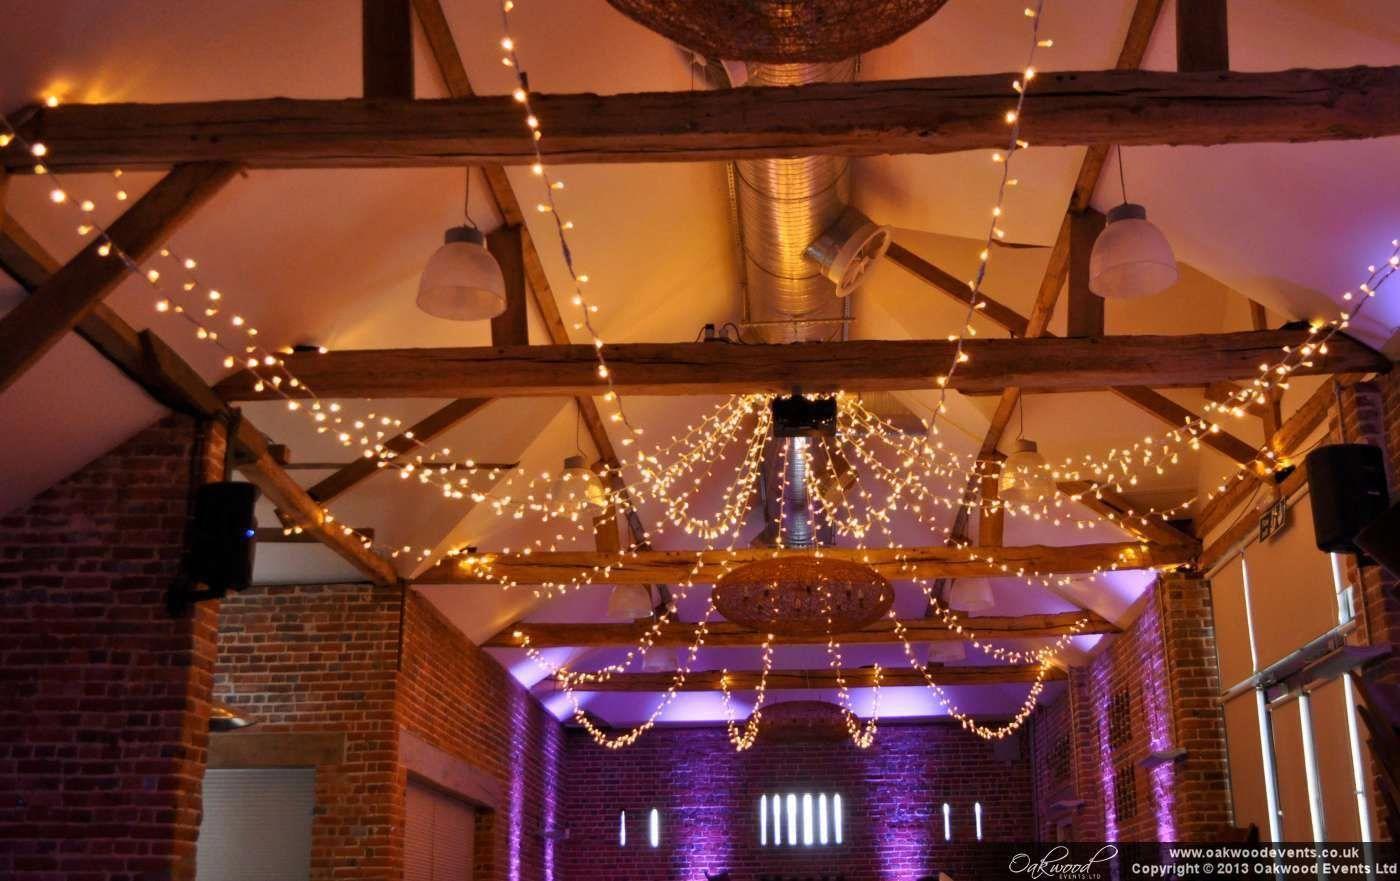 lights above dance floor wedding | Fairy lights and uplighting at Wasing Park #B...#dance #fairy #floor #lights #park #uplighting #wasing #wedding